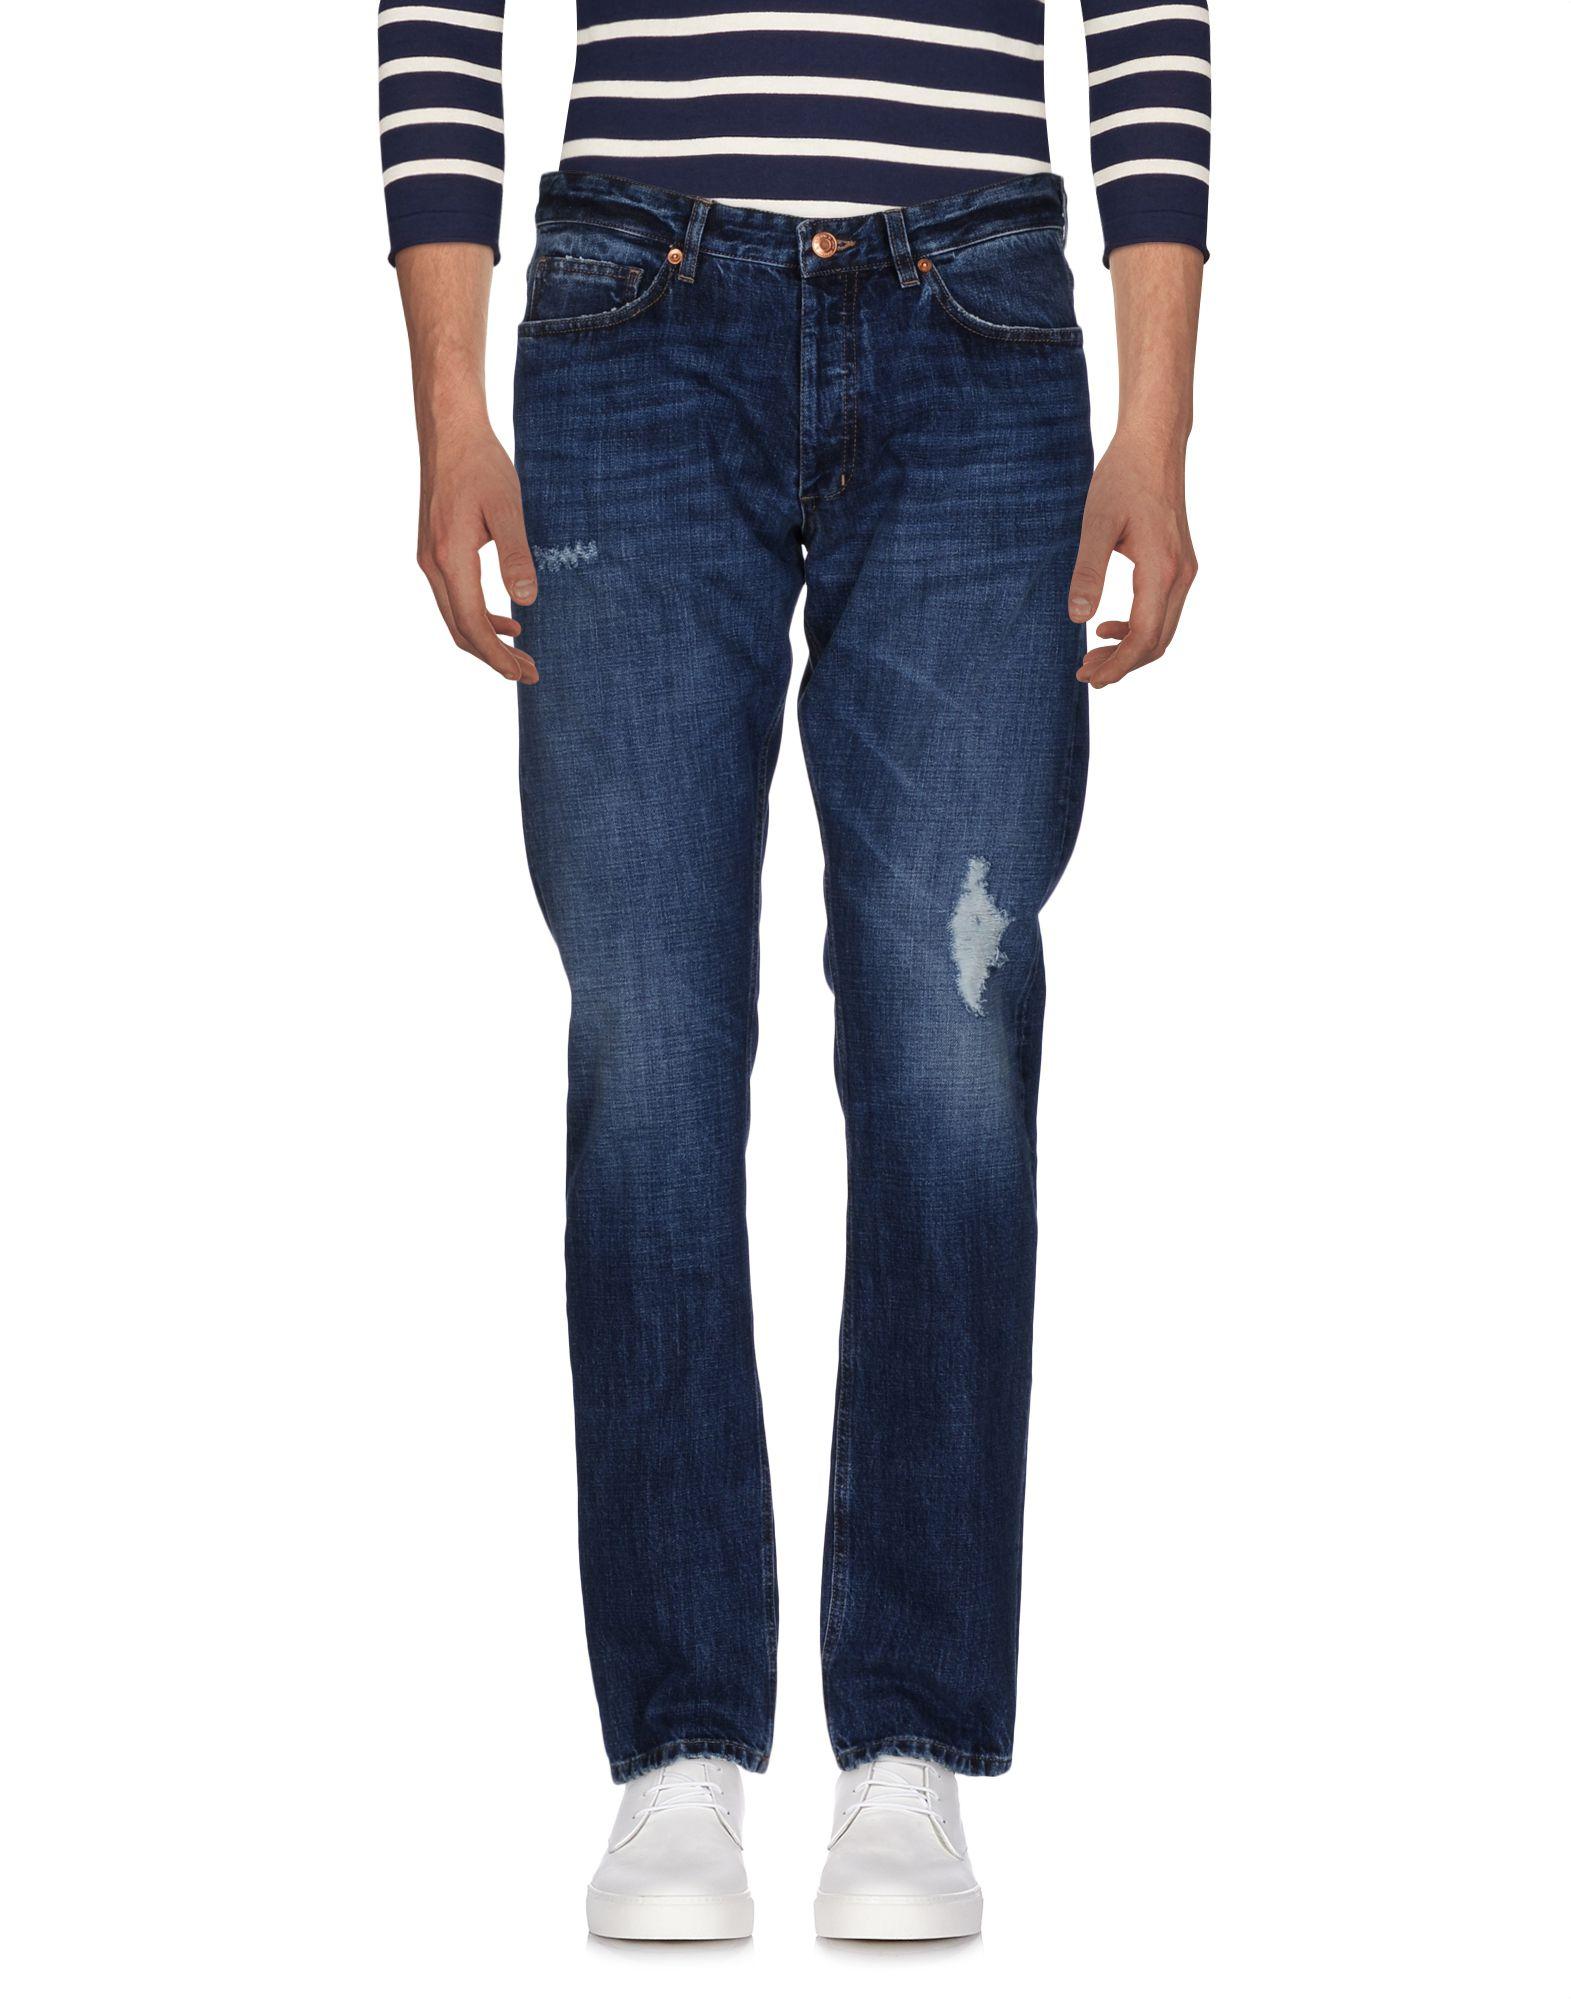 Pantaloni Jeans M.Grifoni Denim Uomo - Acquista online su